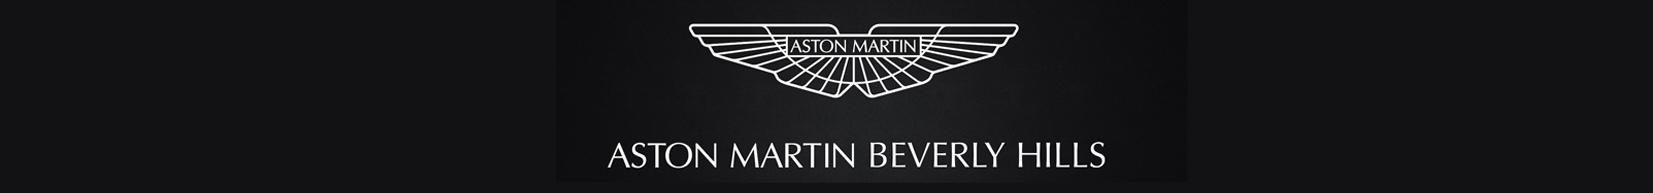 Aston Martin Beverly Hills